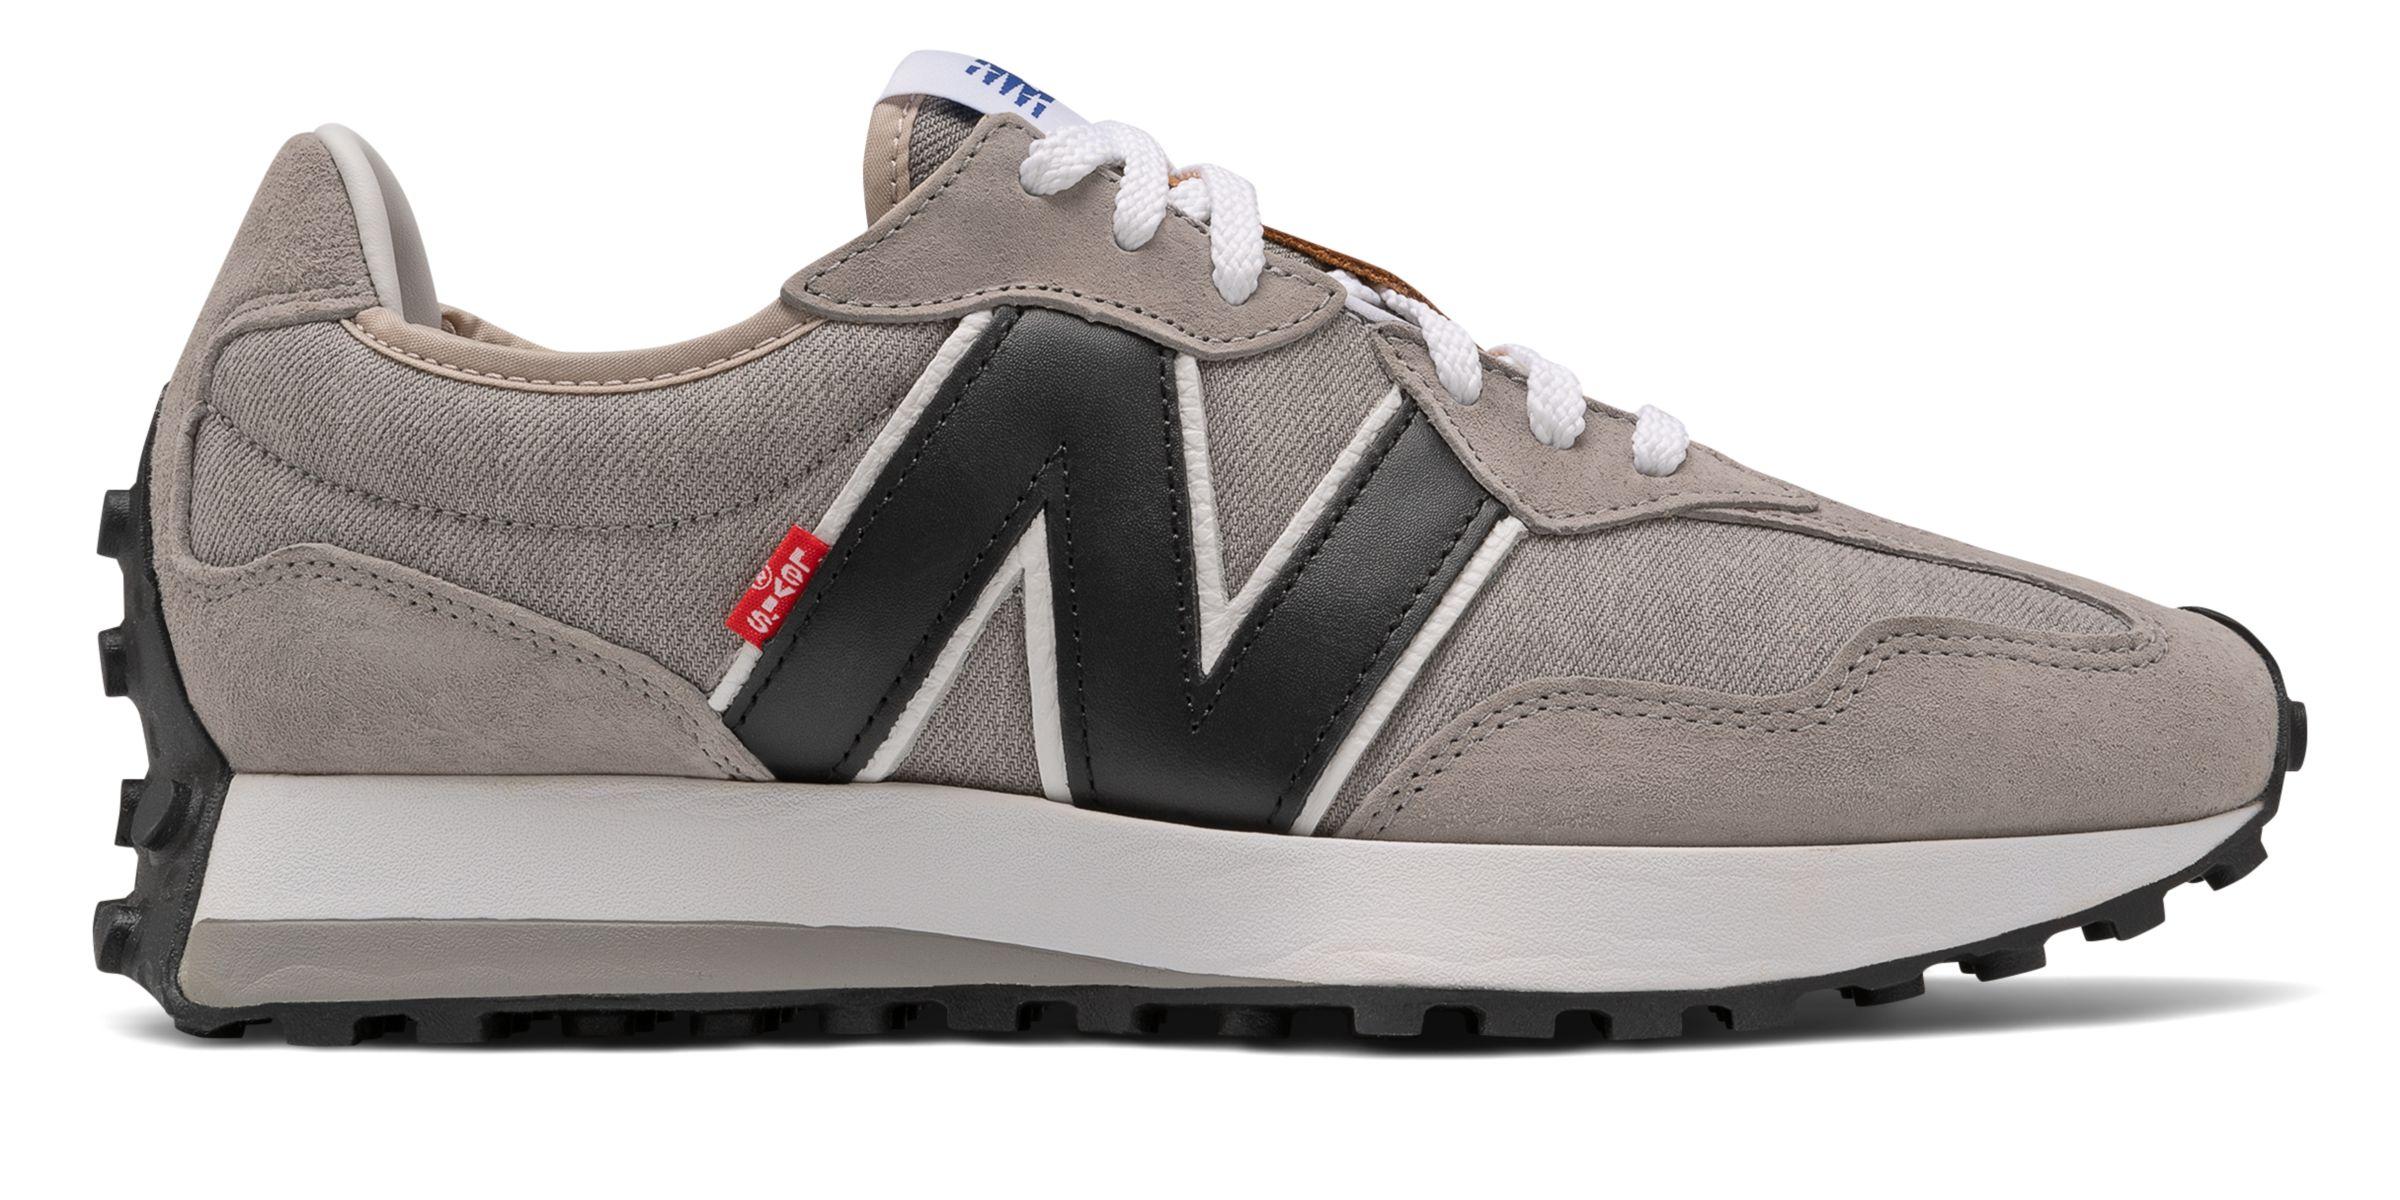 NB New Balance x Levis 327, MS327LVB, Grey with Black